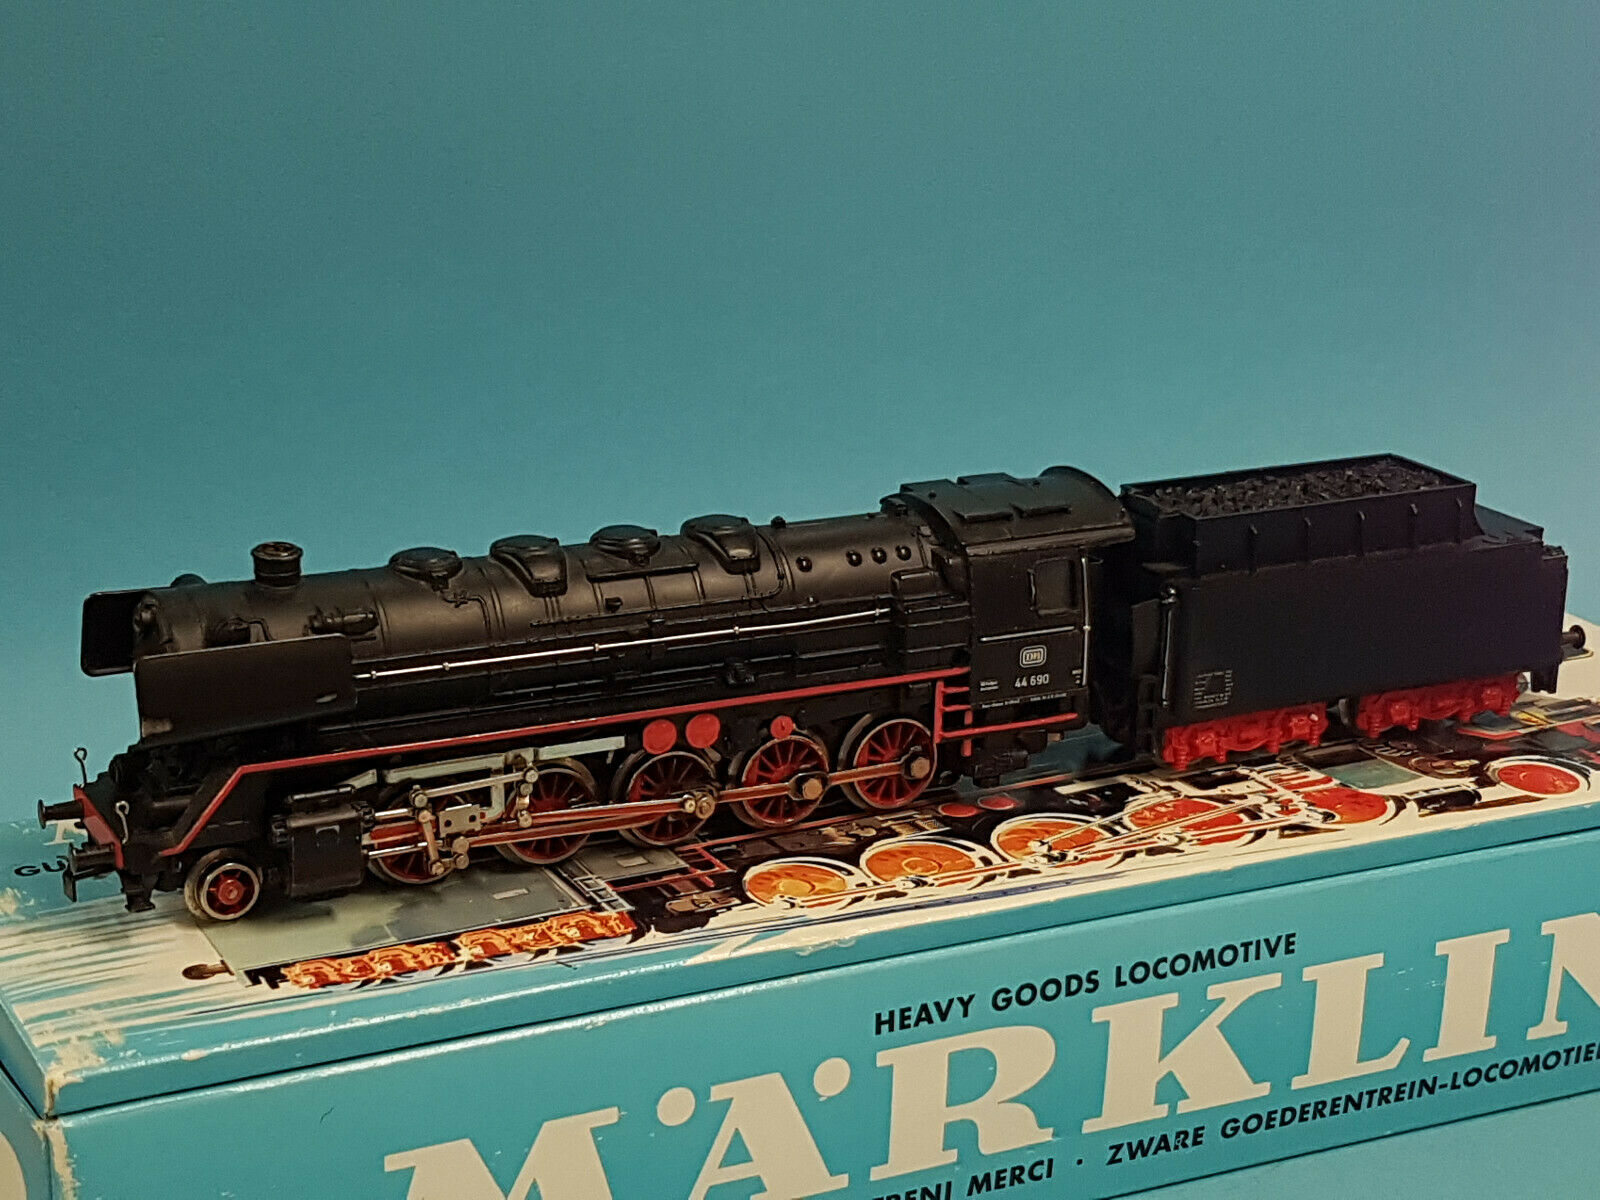 Märklin 3047 locomotiva BR 44 690 DB + telex FRIZIONE + FUMO TOP + OVP